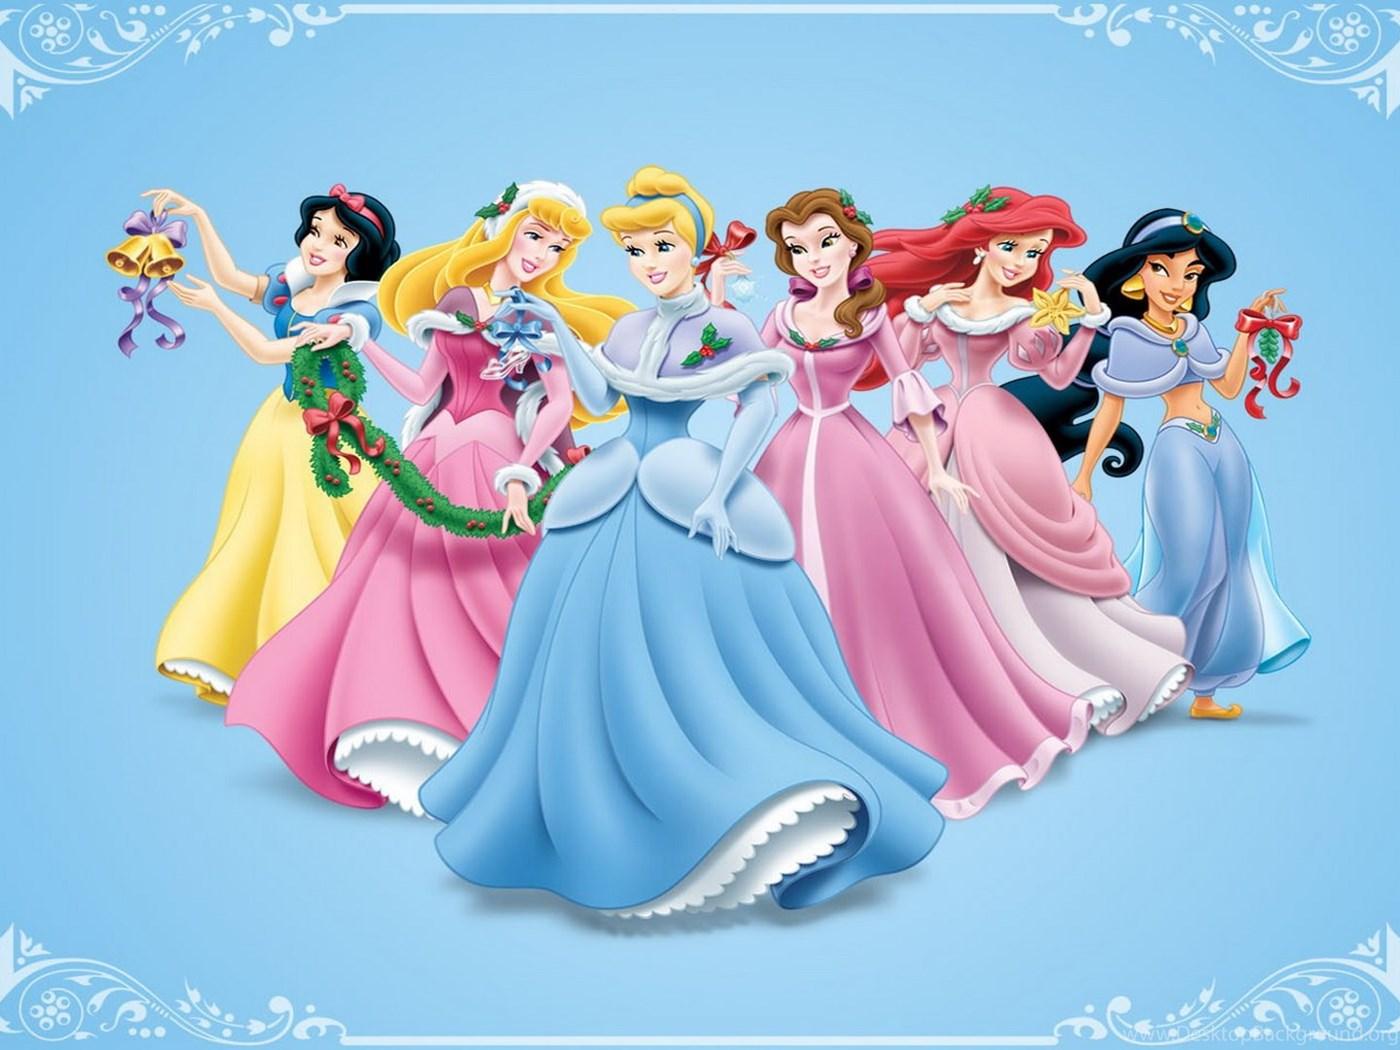 High Resolution Disney Wallpaper: High Resolution Disney Princess HD 1080p Wallpapers Full